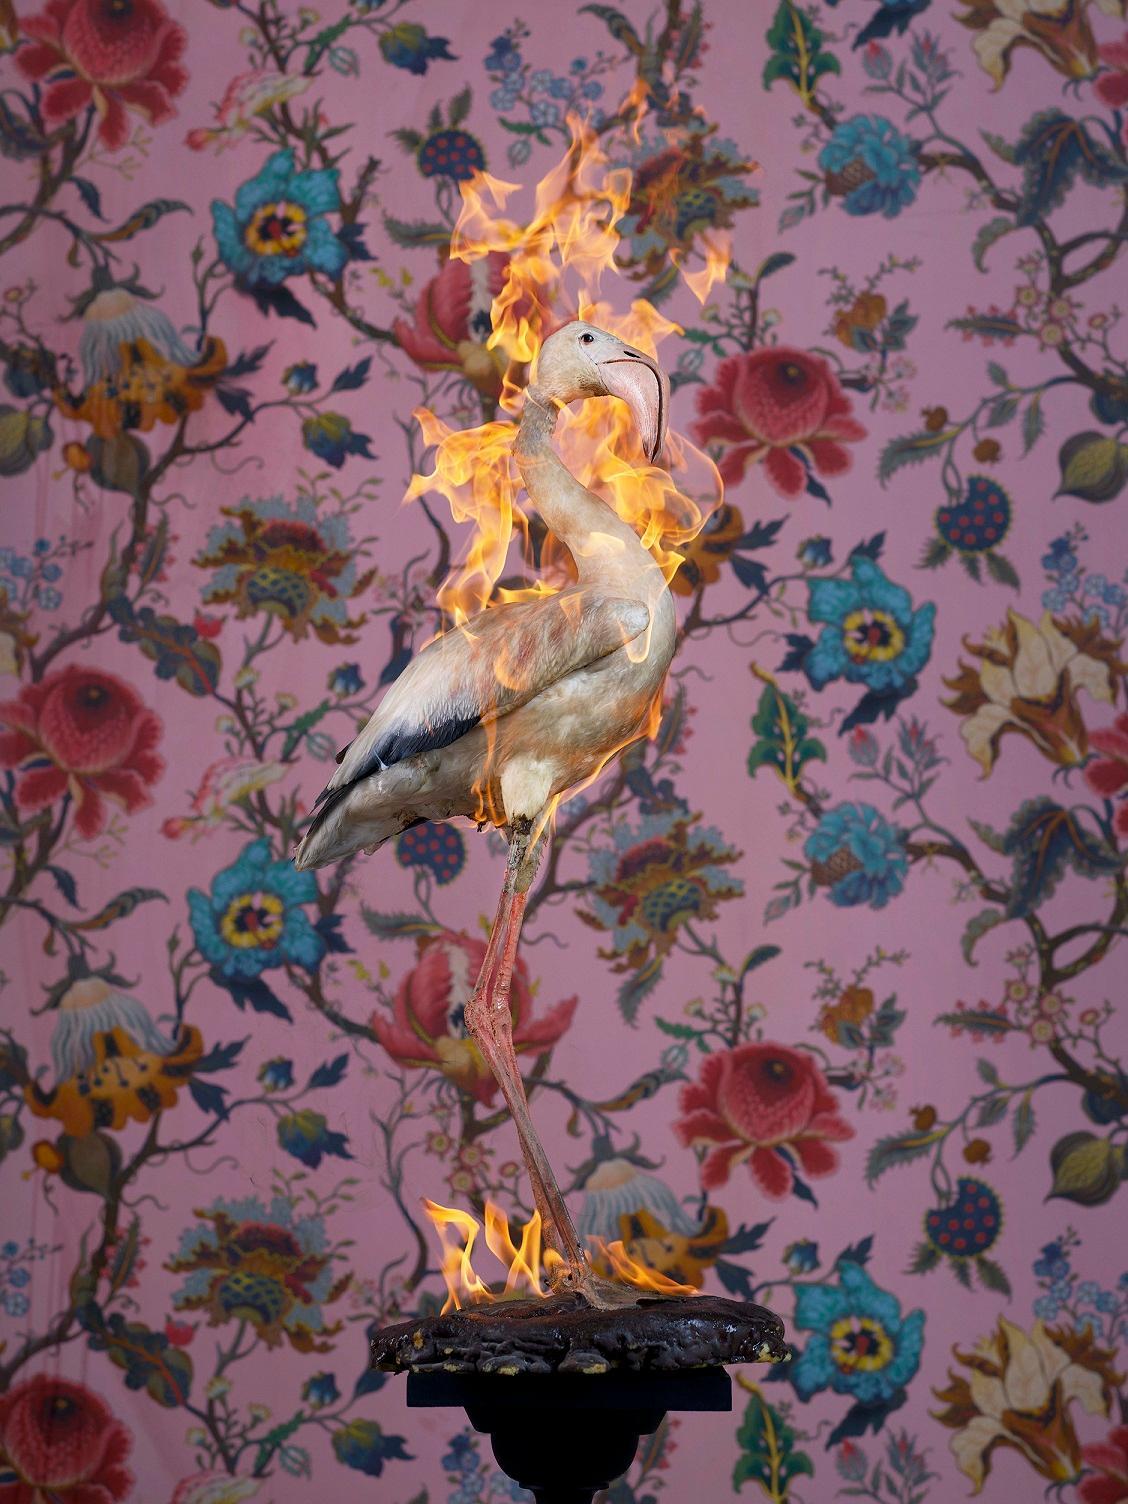 Flamingo, Residence of Impermanence series